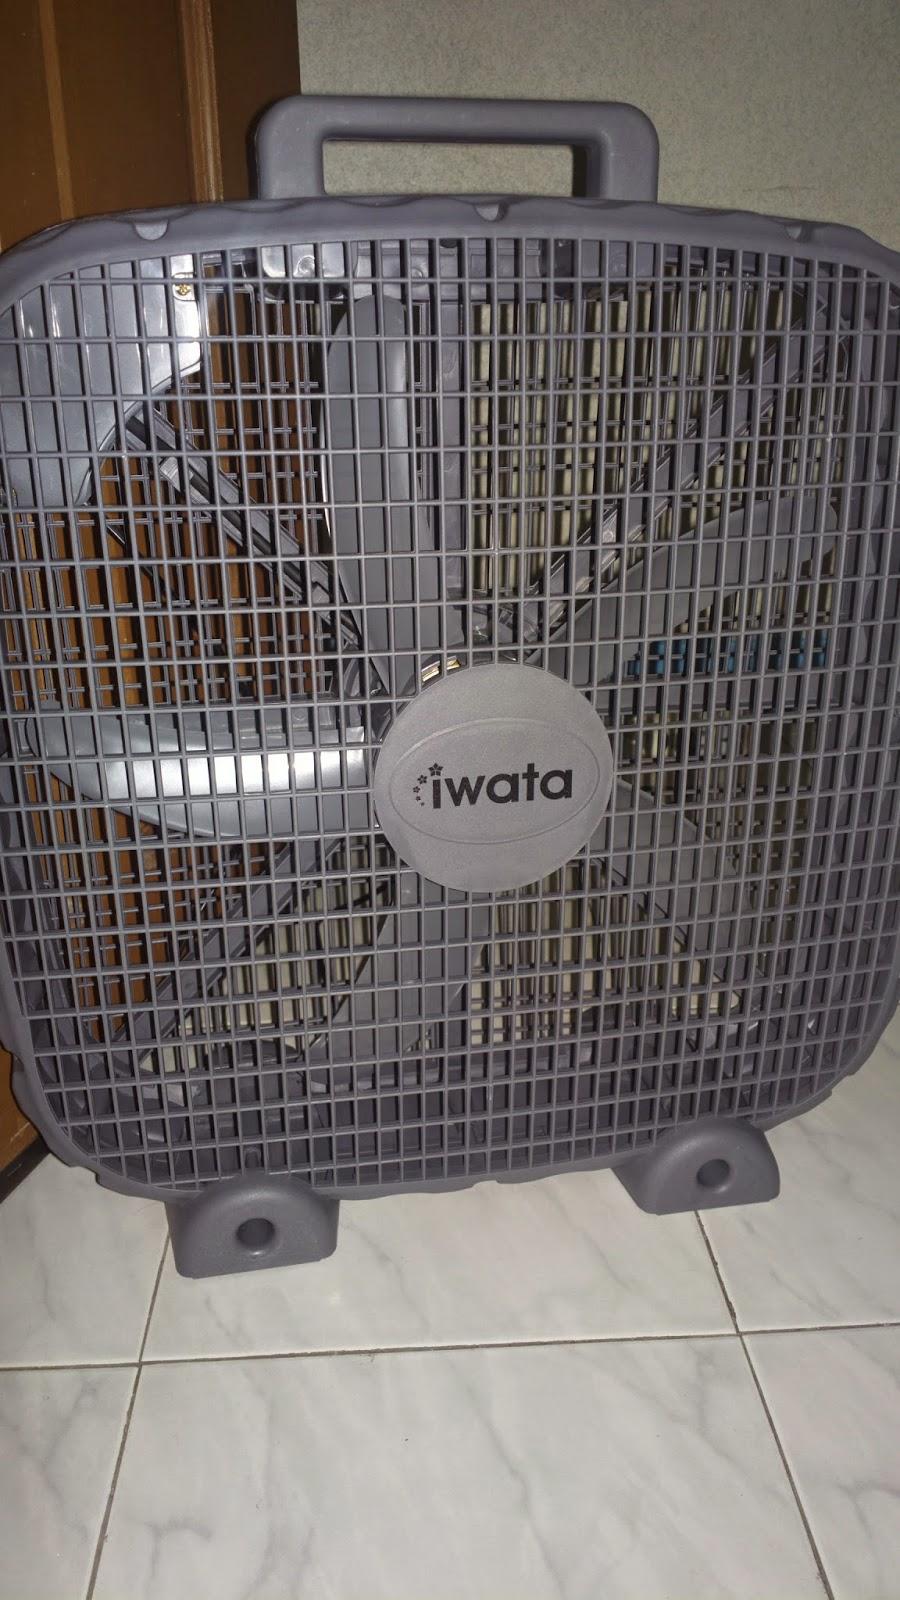 The Iwata Industrial Box Fan